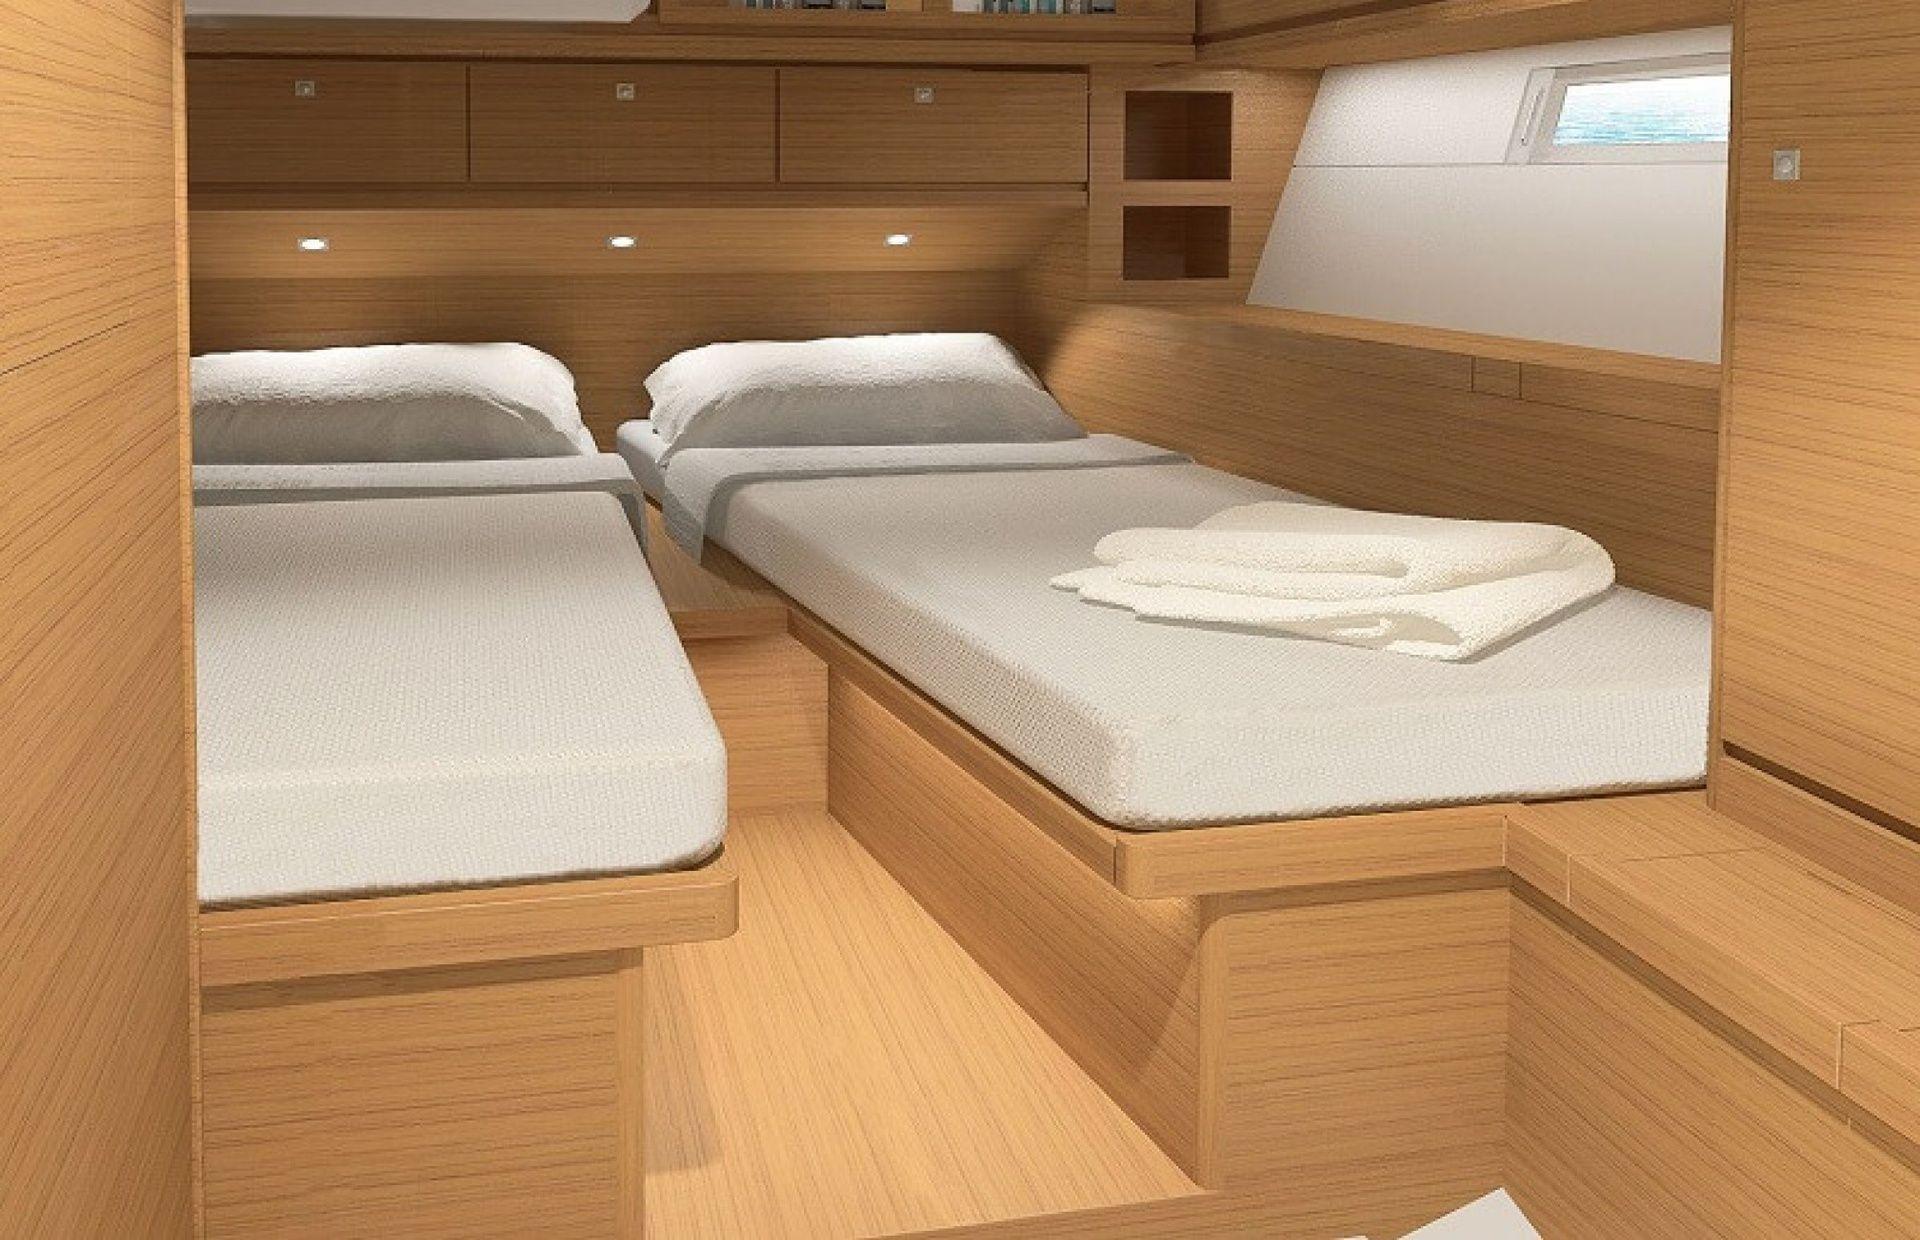 https://media.insailing.com/boat/dufour-520/image_1571034847426.jpg